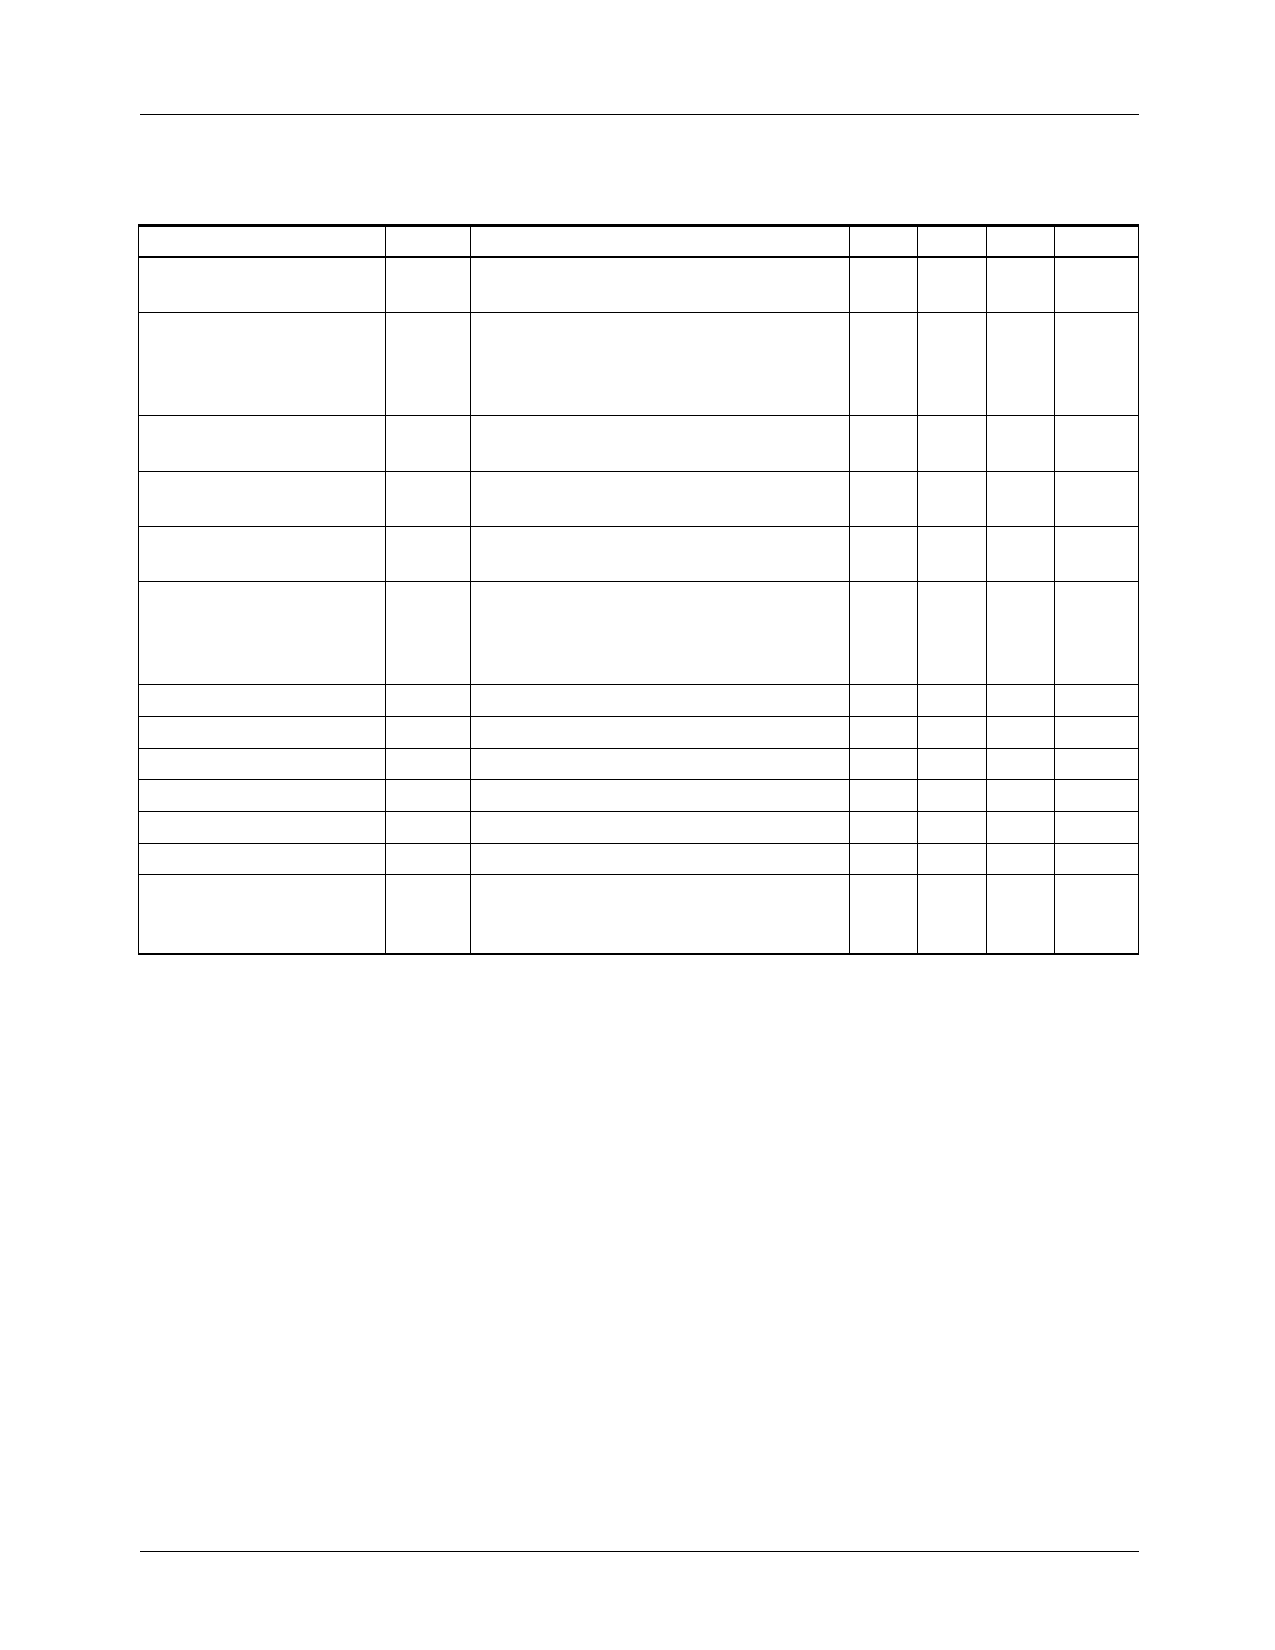 KA78T12 pdf, ピン配列